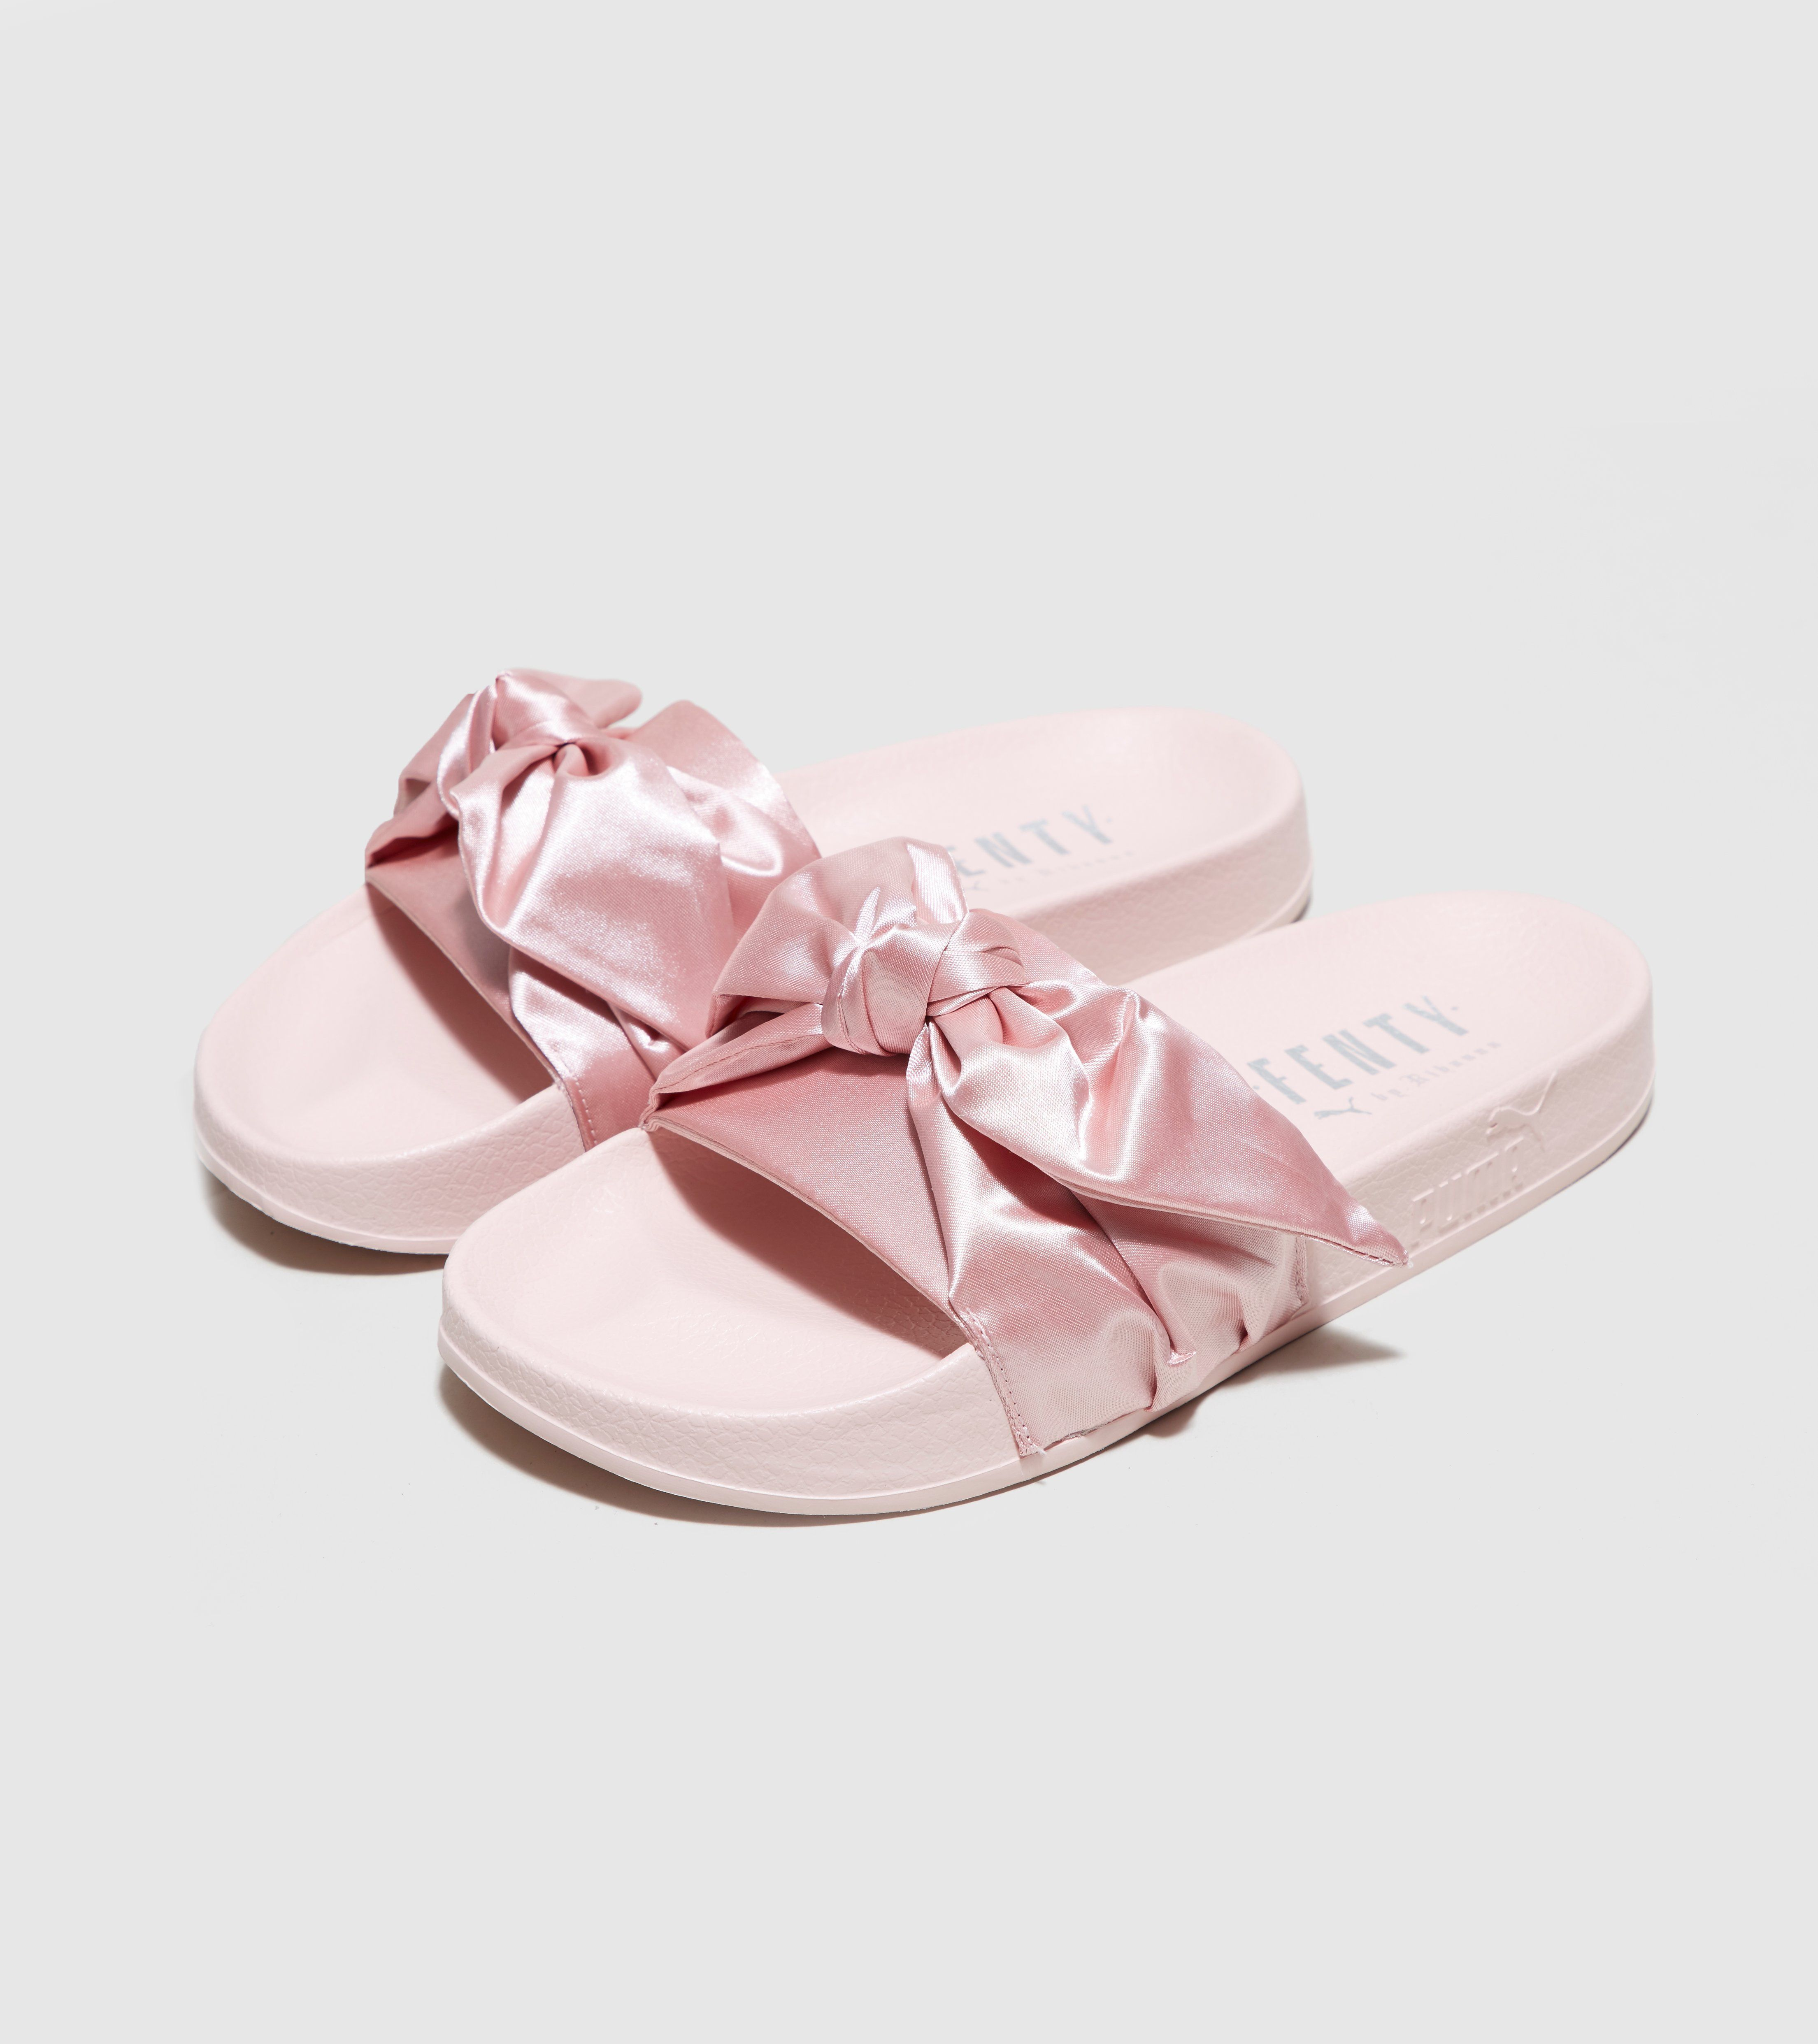 premium selection 3e5f5 289b3 Fenty Puma Bow Slide, Colour Pink or Baby Blue, Size 6 ...